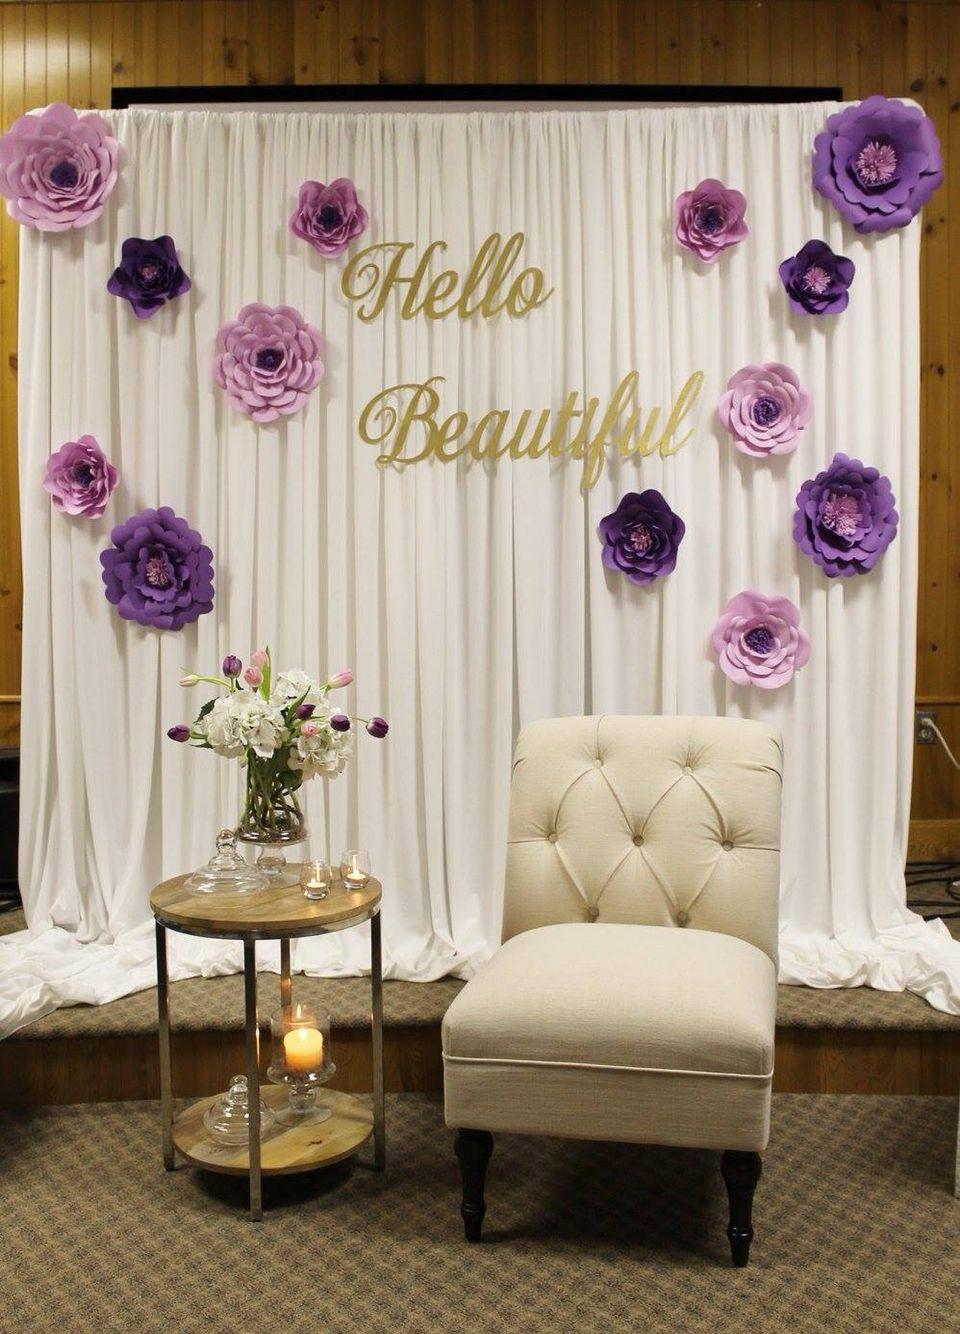 Bridal shower decor special event decor purple bridal shower